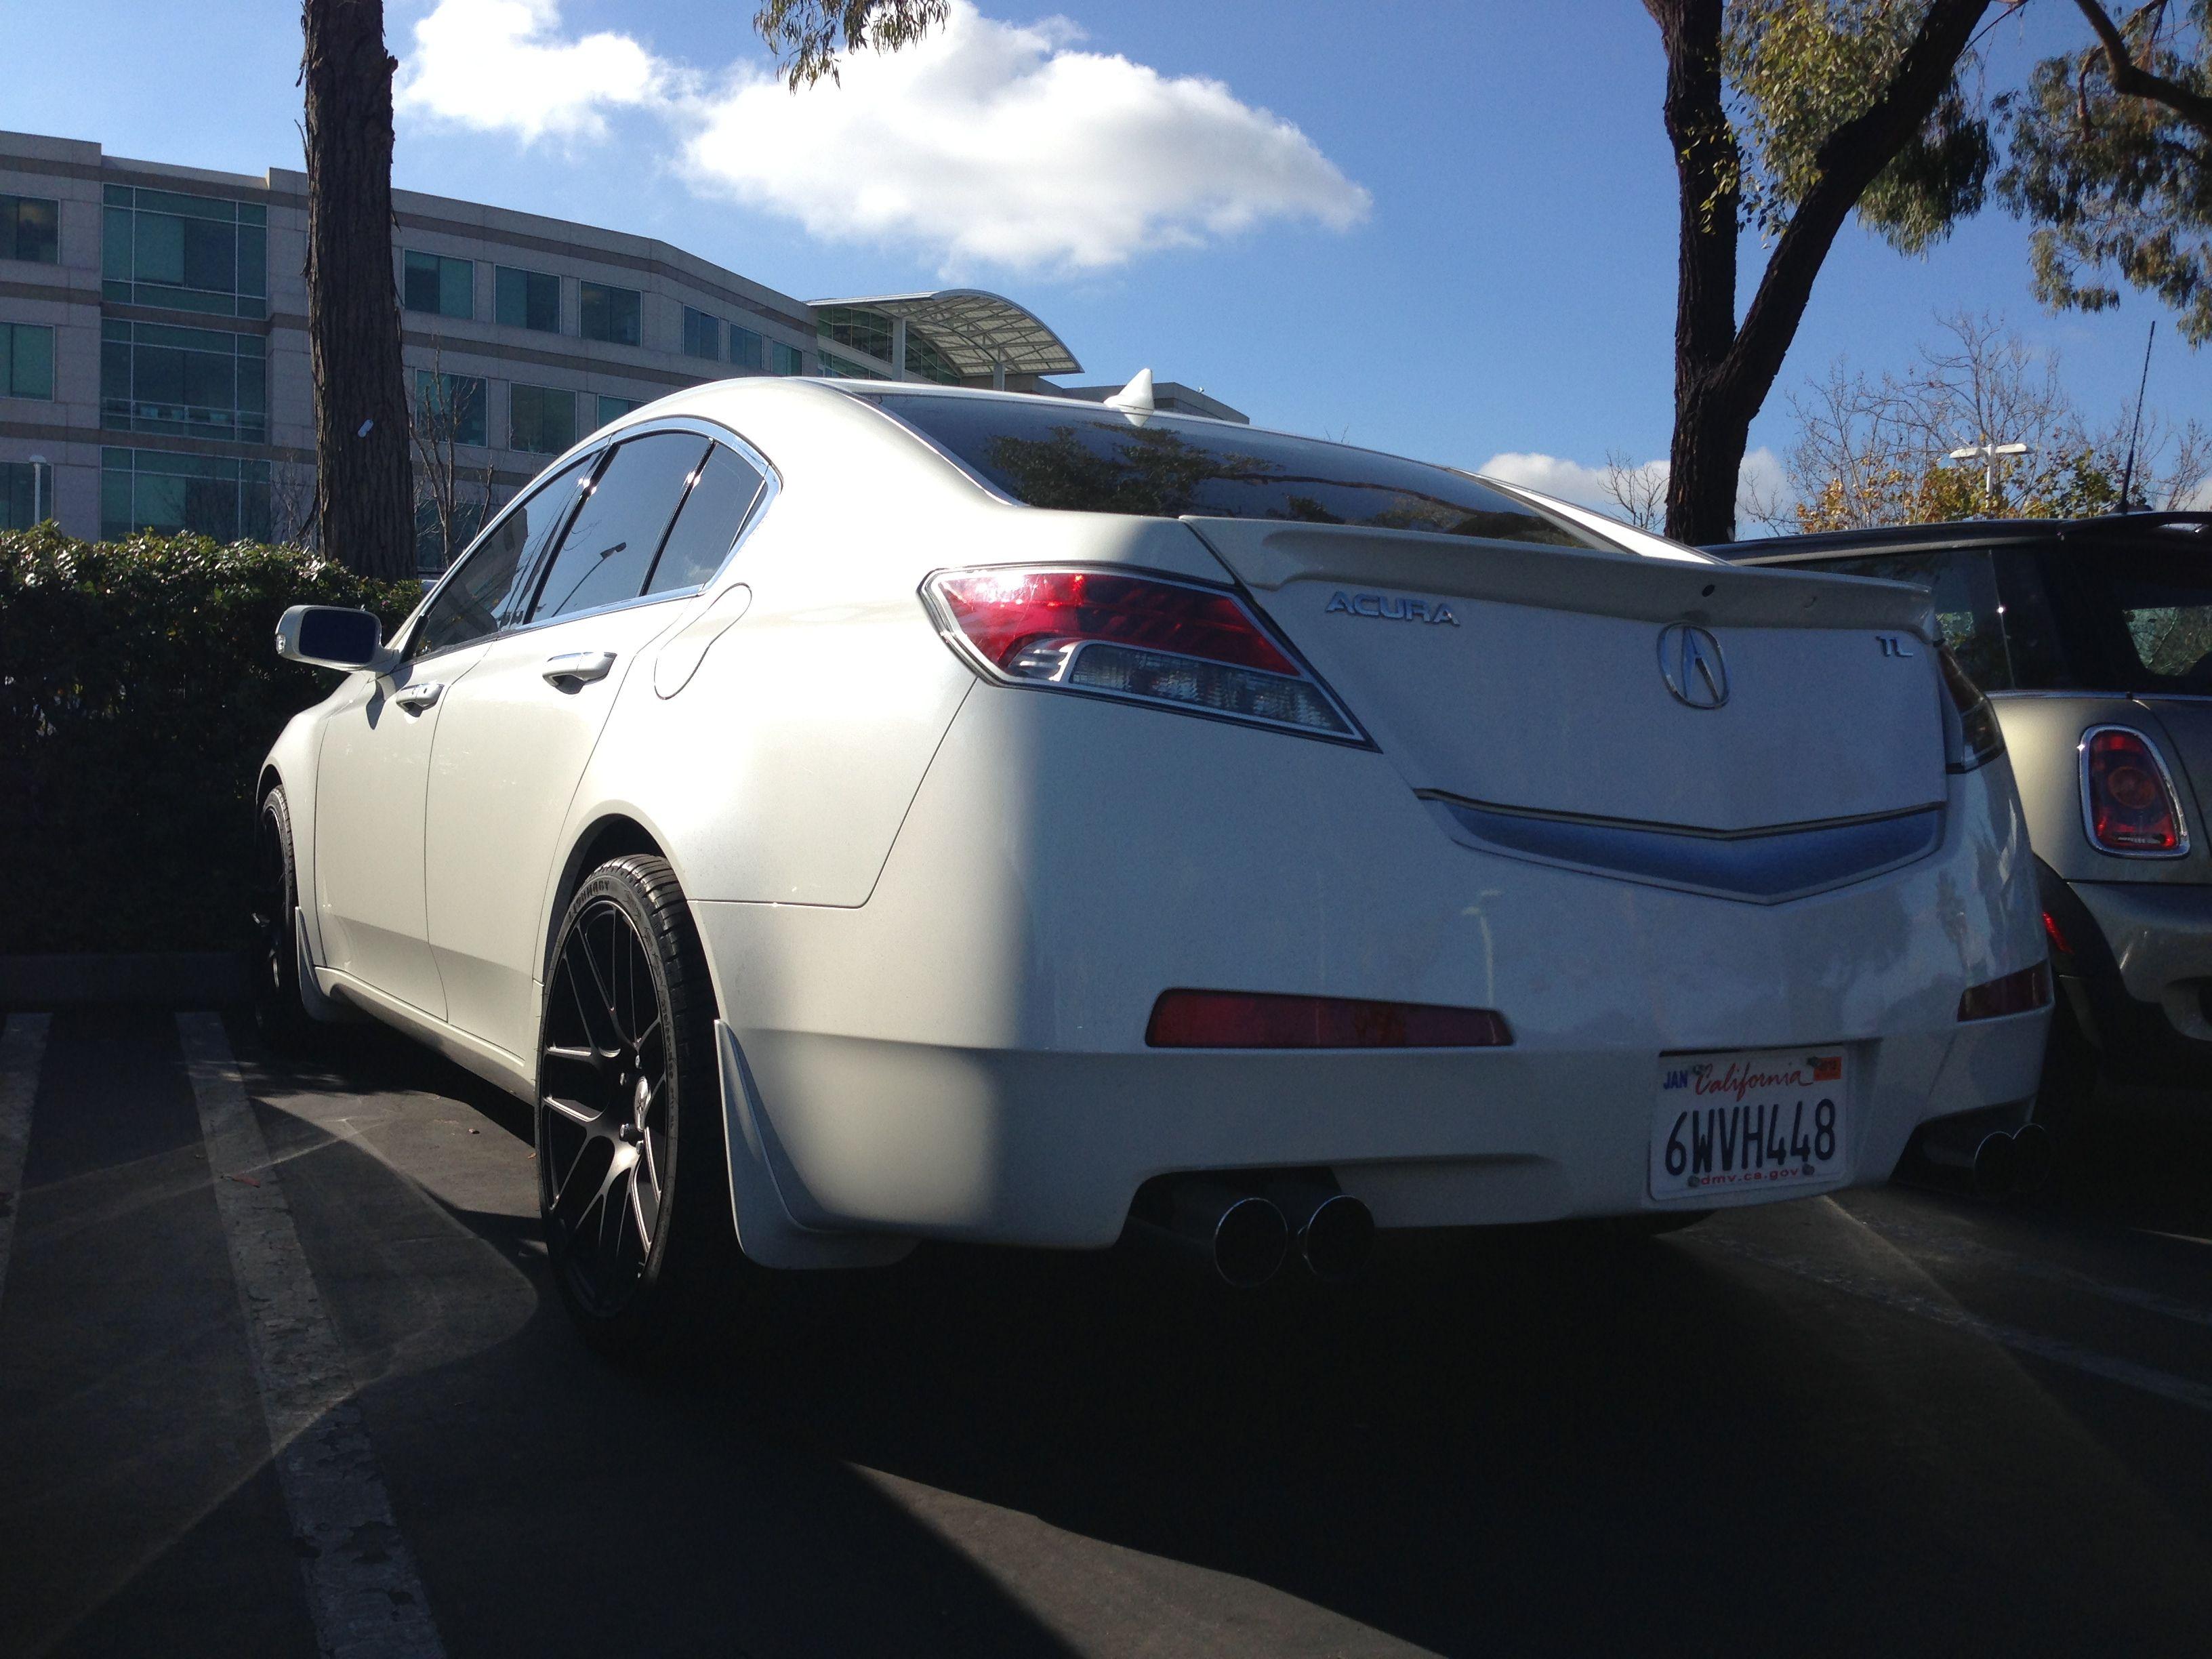 acura review rnr blog tsx headlights automotive tl